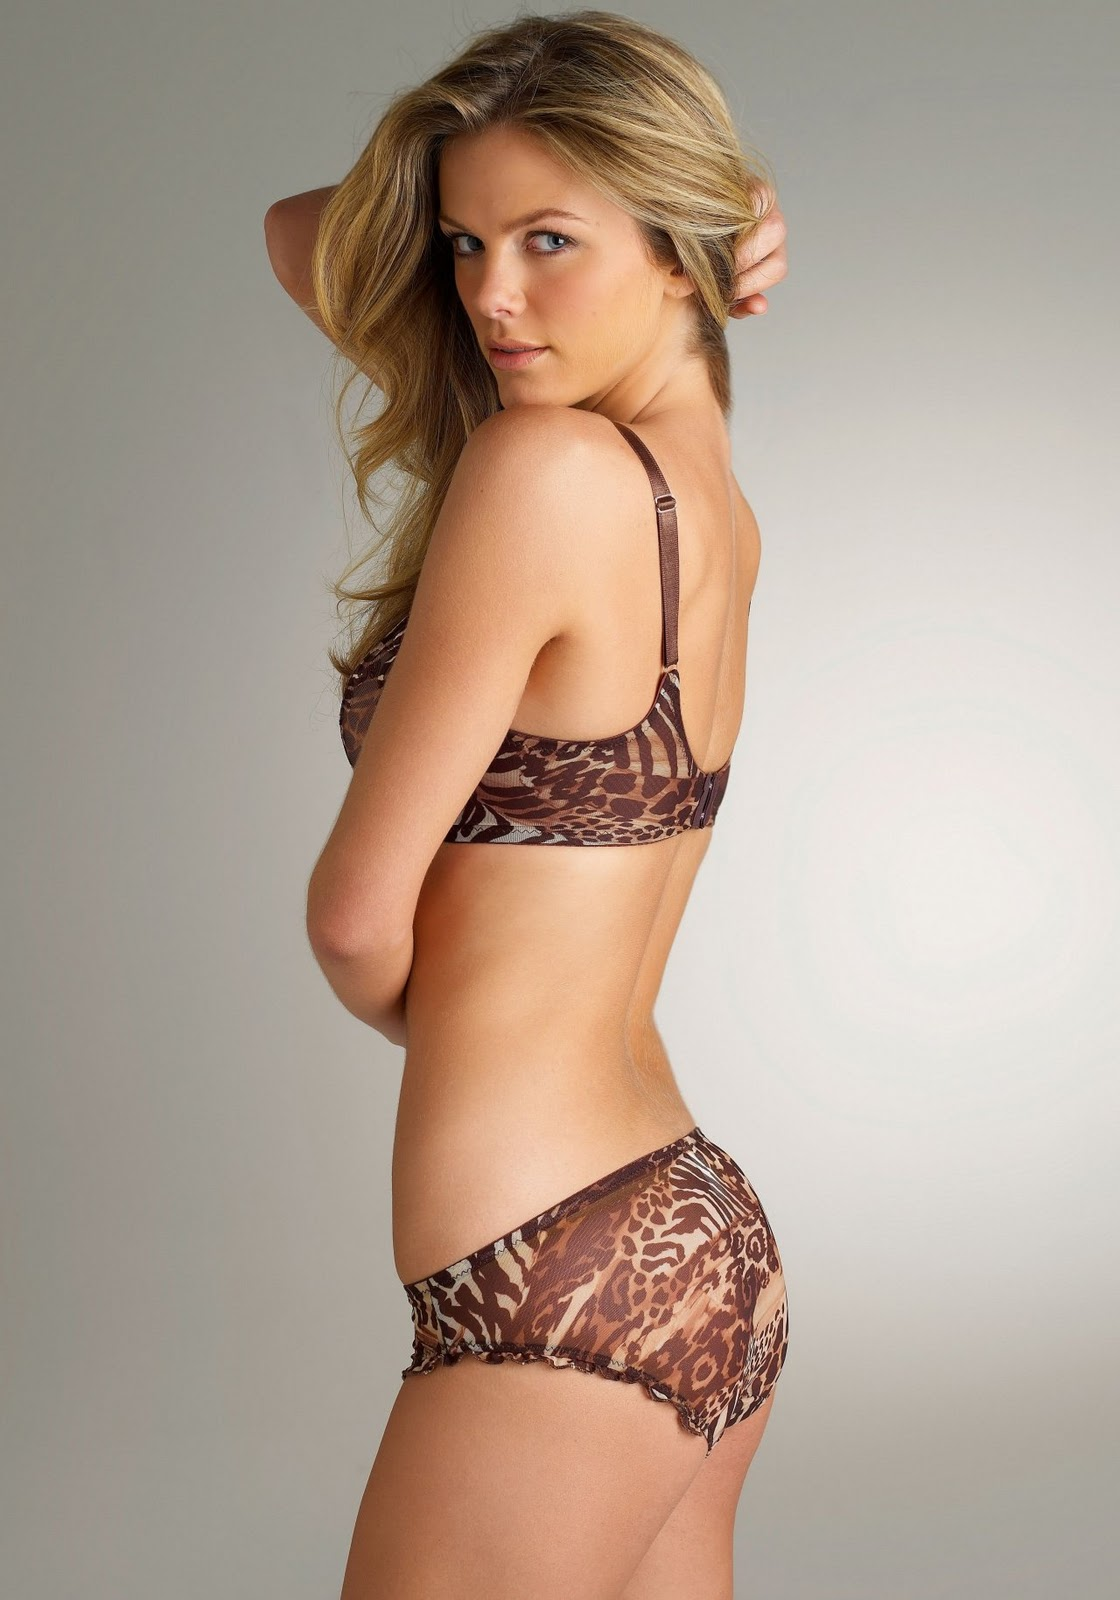 Beth Behrs Hot